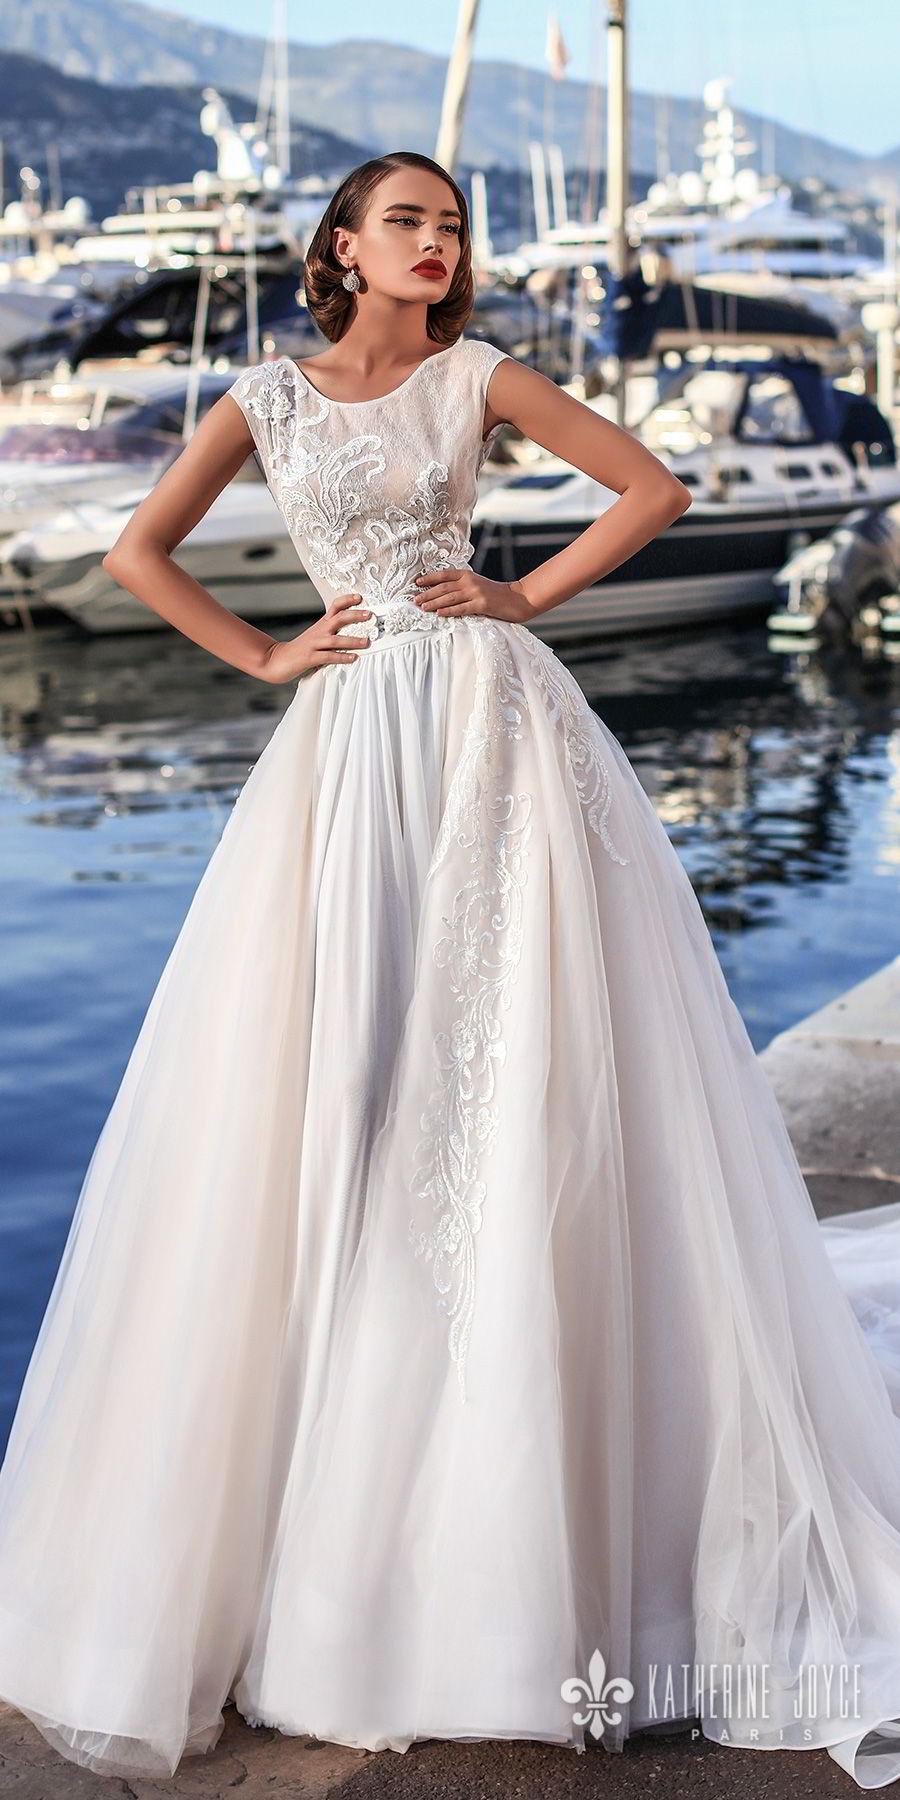 katherine joyce 2018 bridal sleeveless jewel neck heavily embellished bodice romantic ball gown a  line wedding dress scoop back chapel train (mari) mv